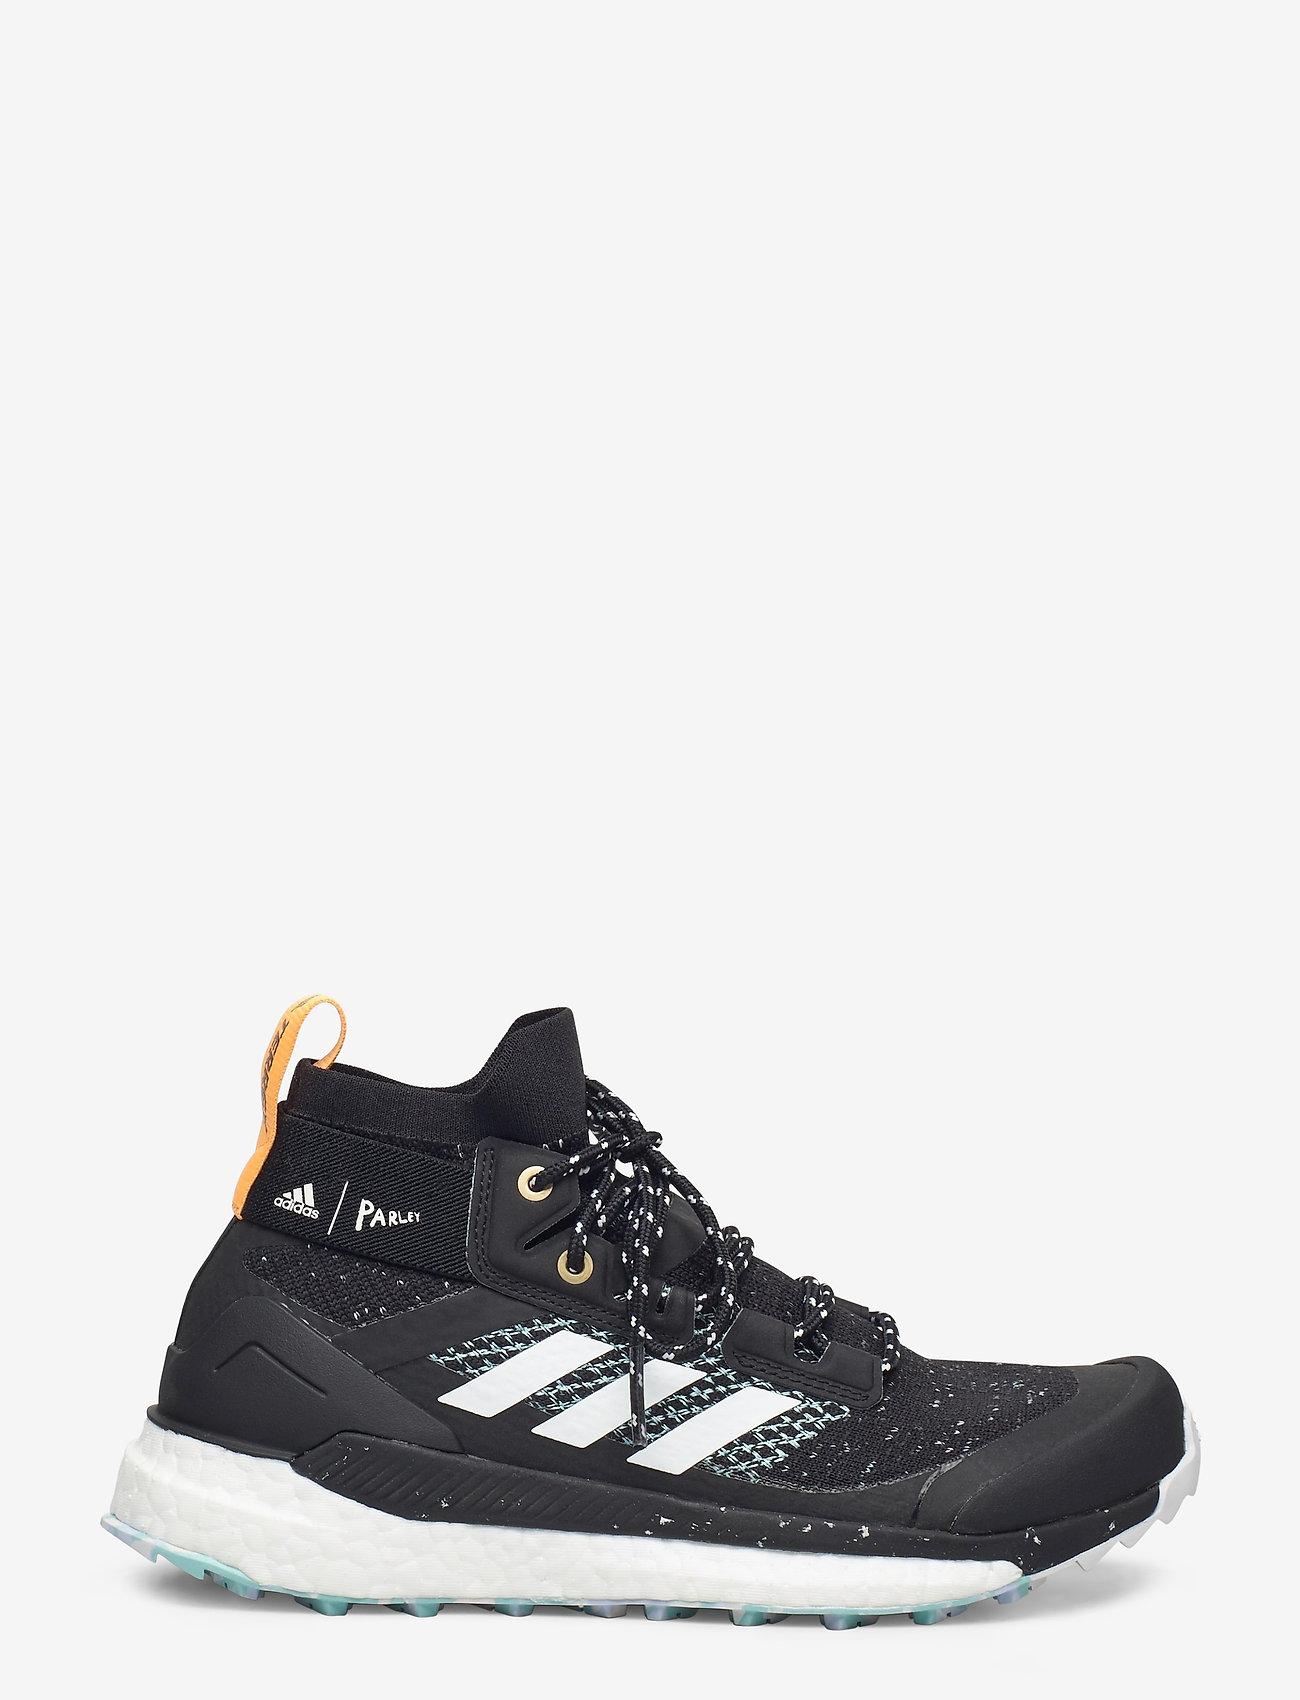 adidas Performance - Terrex Free Hiker Parley Hiking W - wanderschuhe - cblack/ftwwht/reagol - 1